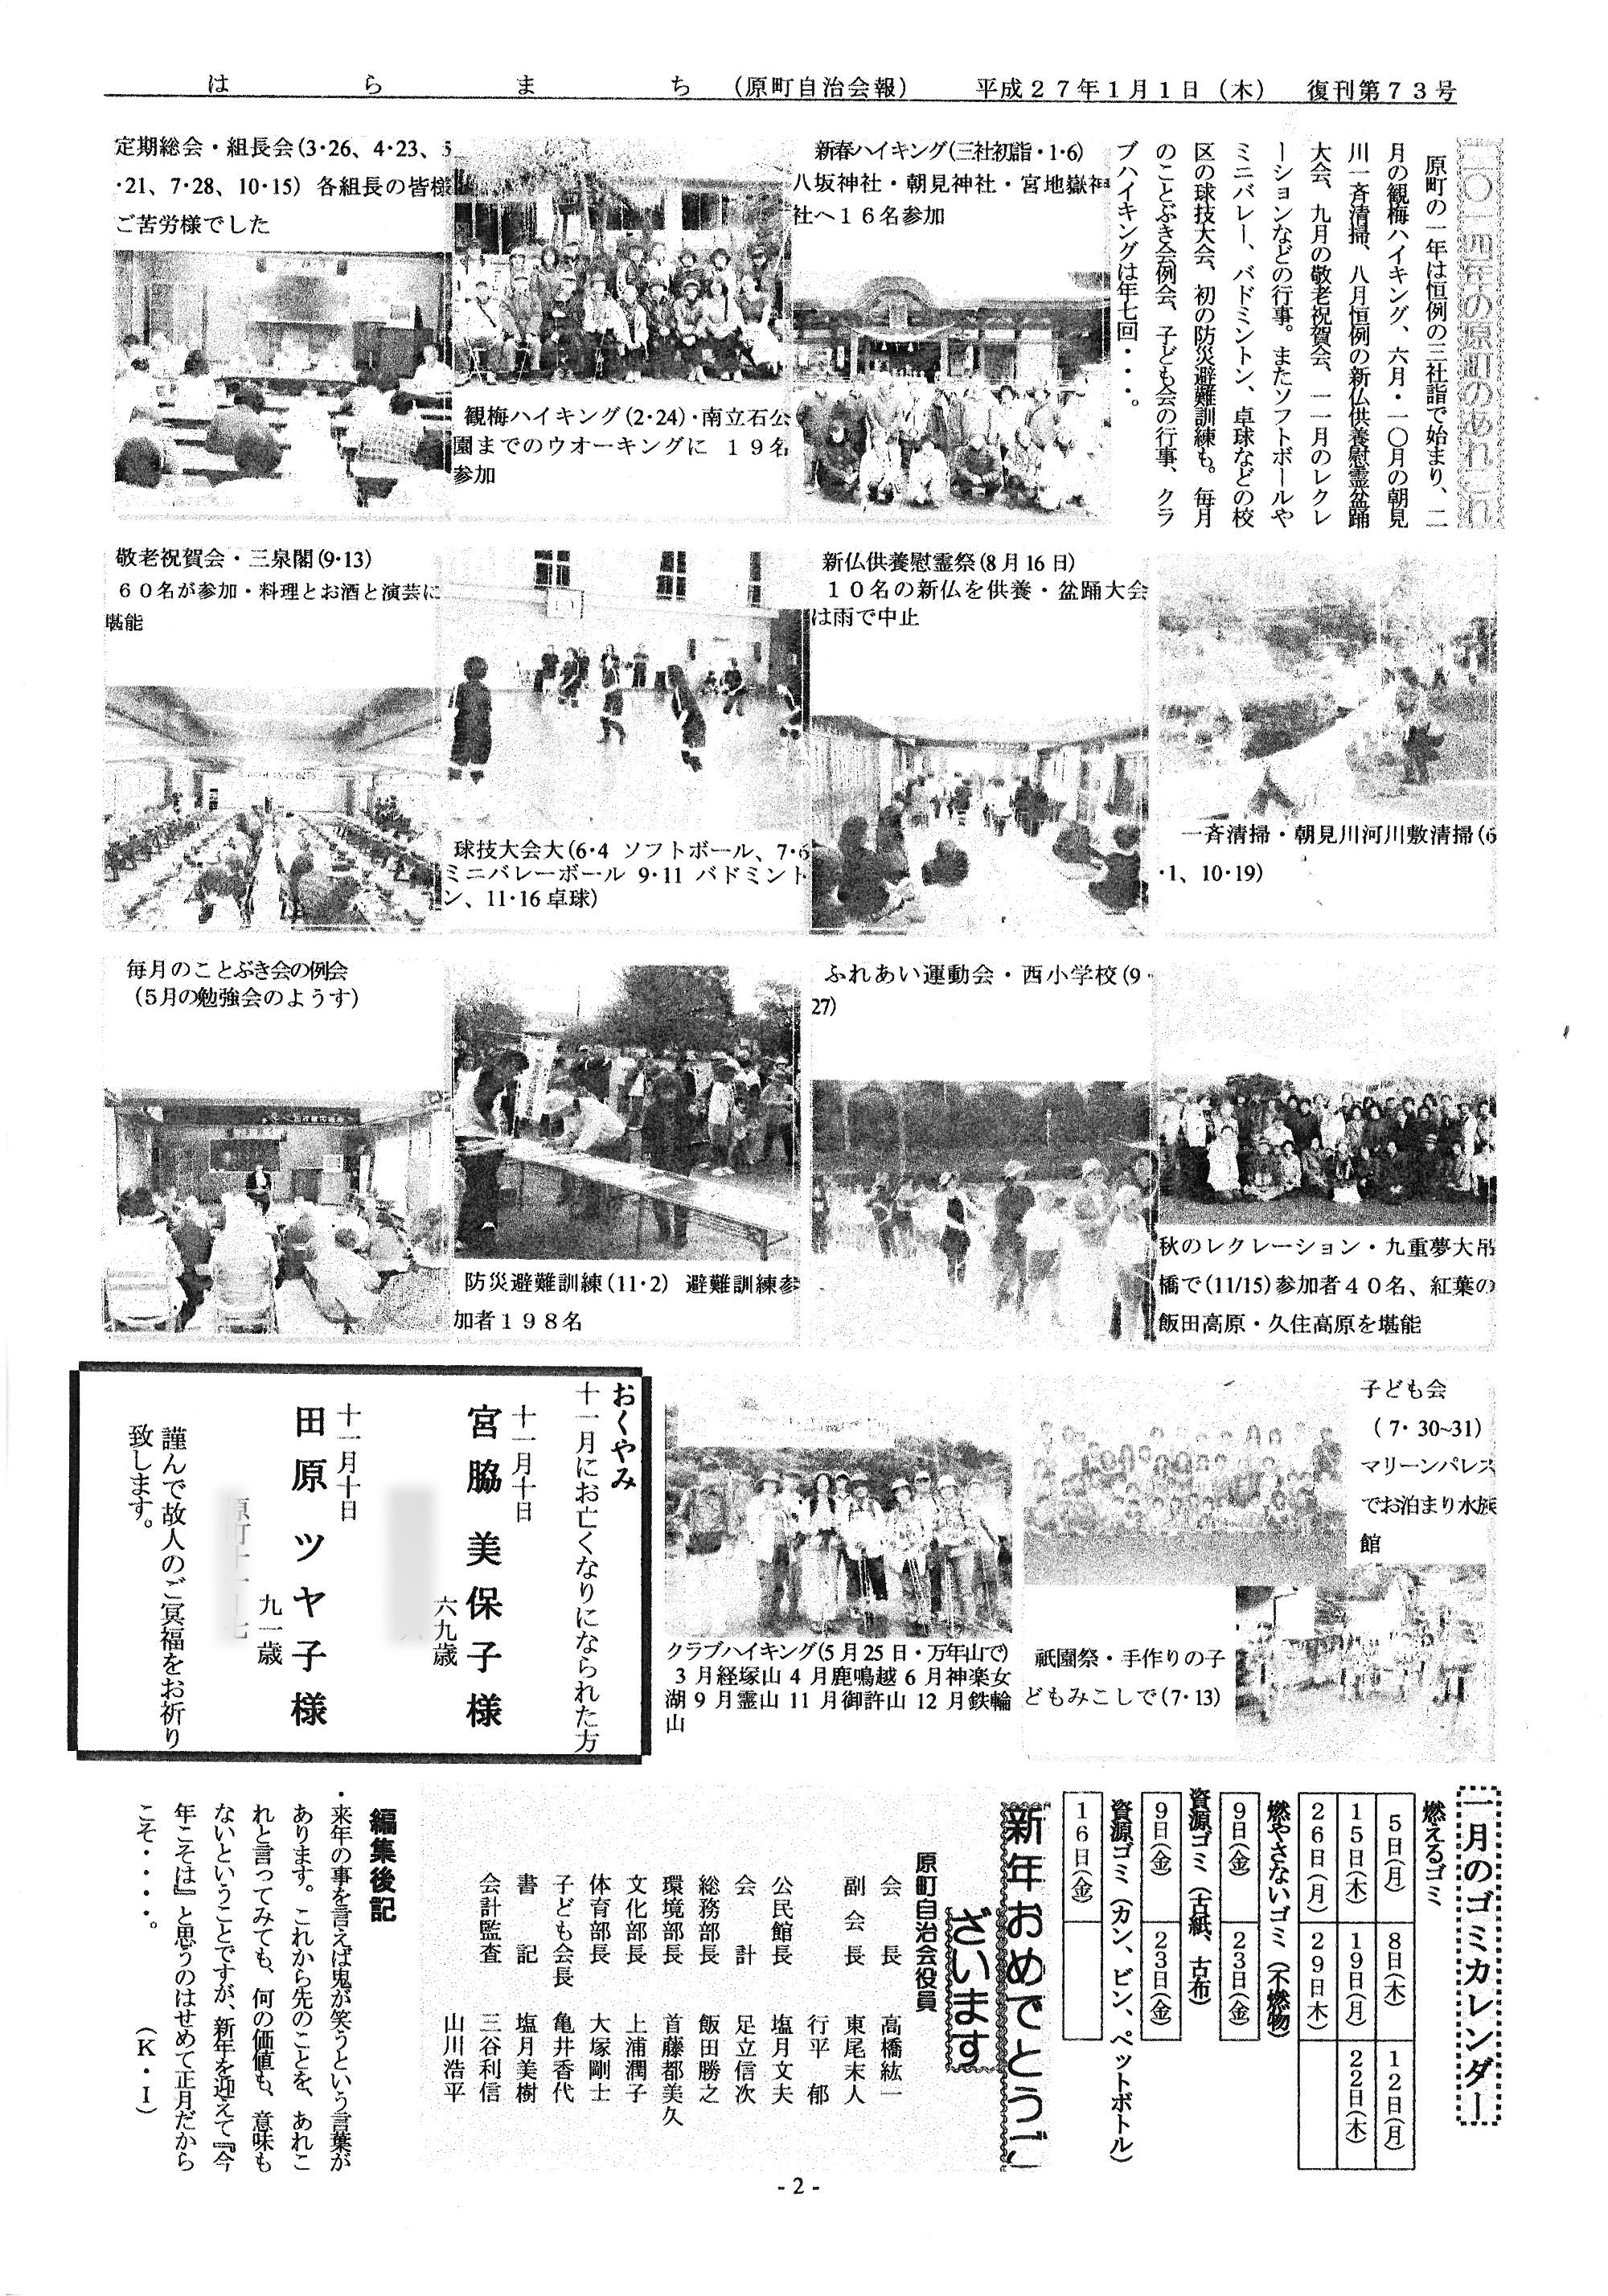 haramachi2015_01_02